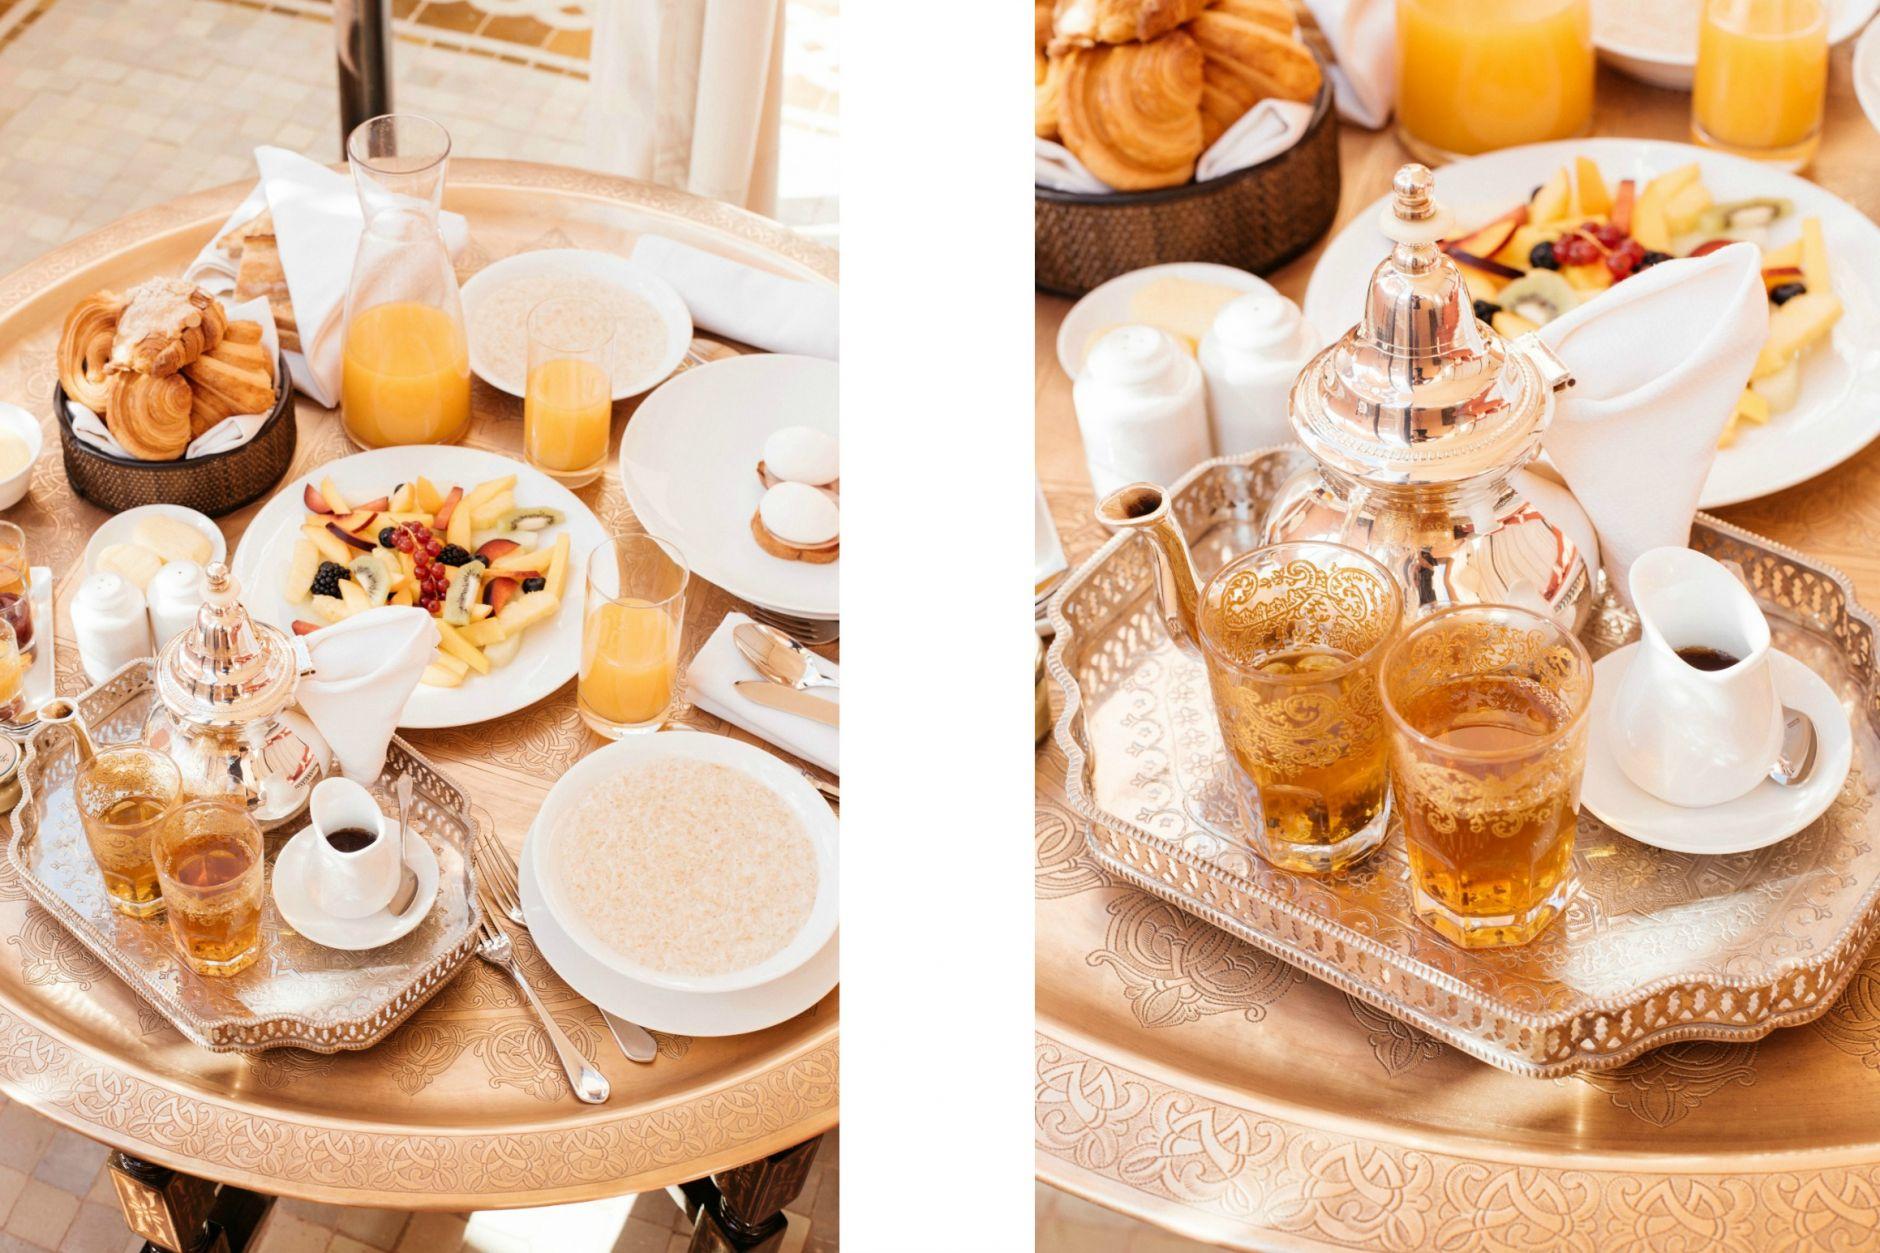 royal-mansour-hotel-luxury-marrakesch-marrakesh-morocco-edisa-shahini-disicouture-blog-duo-03